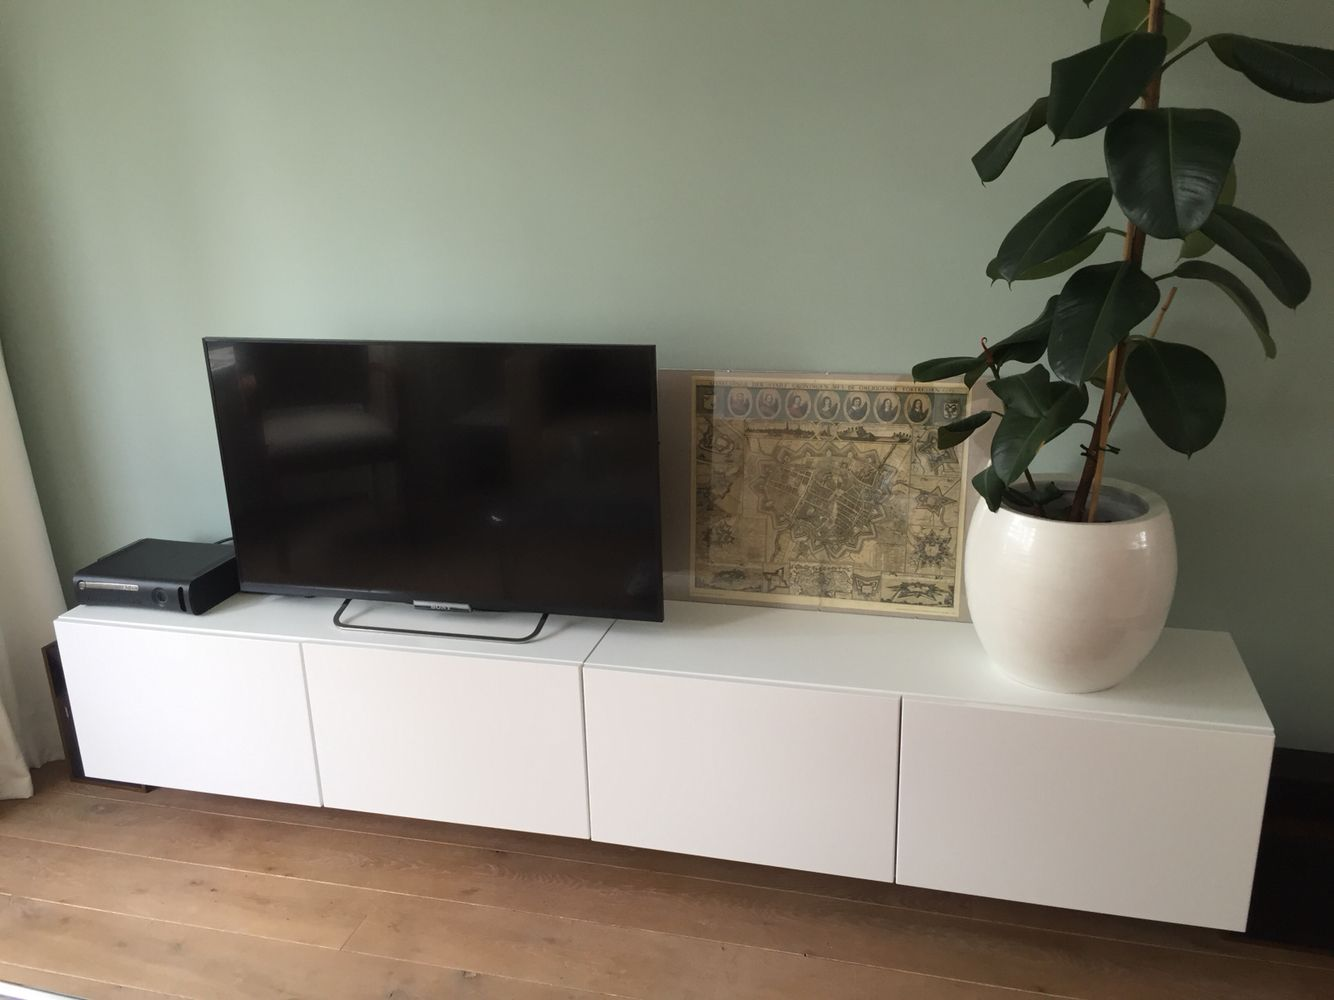 Tv meubel, Besta Ikea, Early Dew Flexa